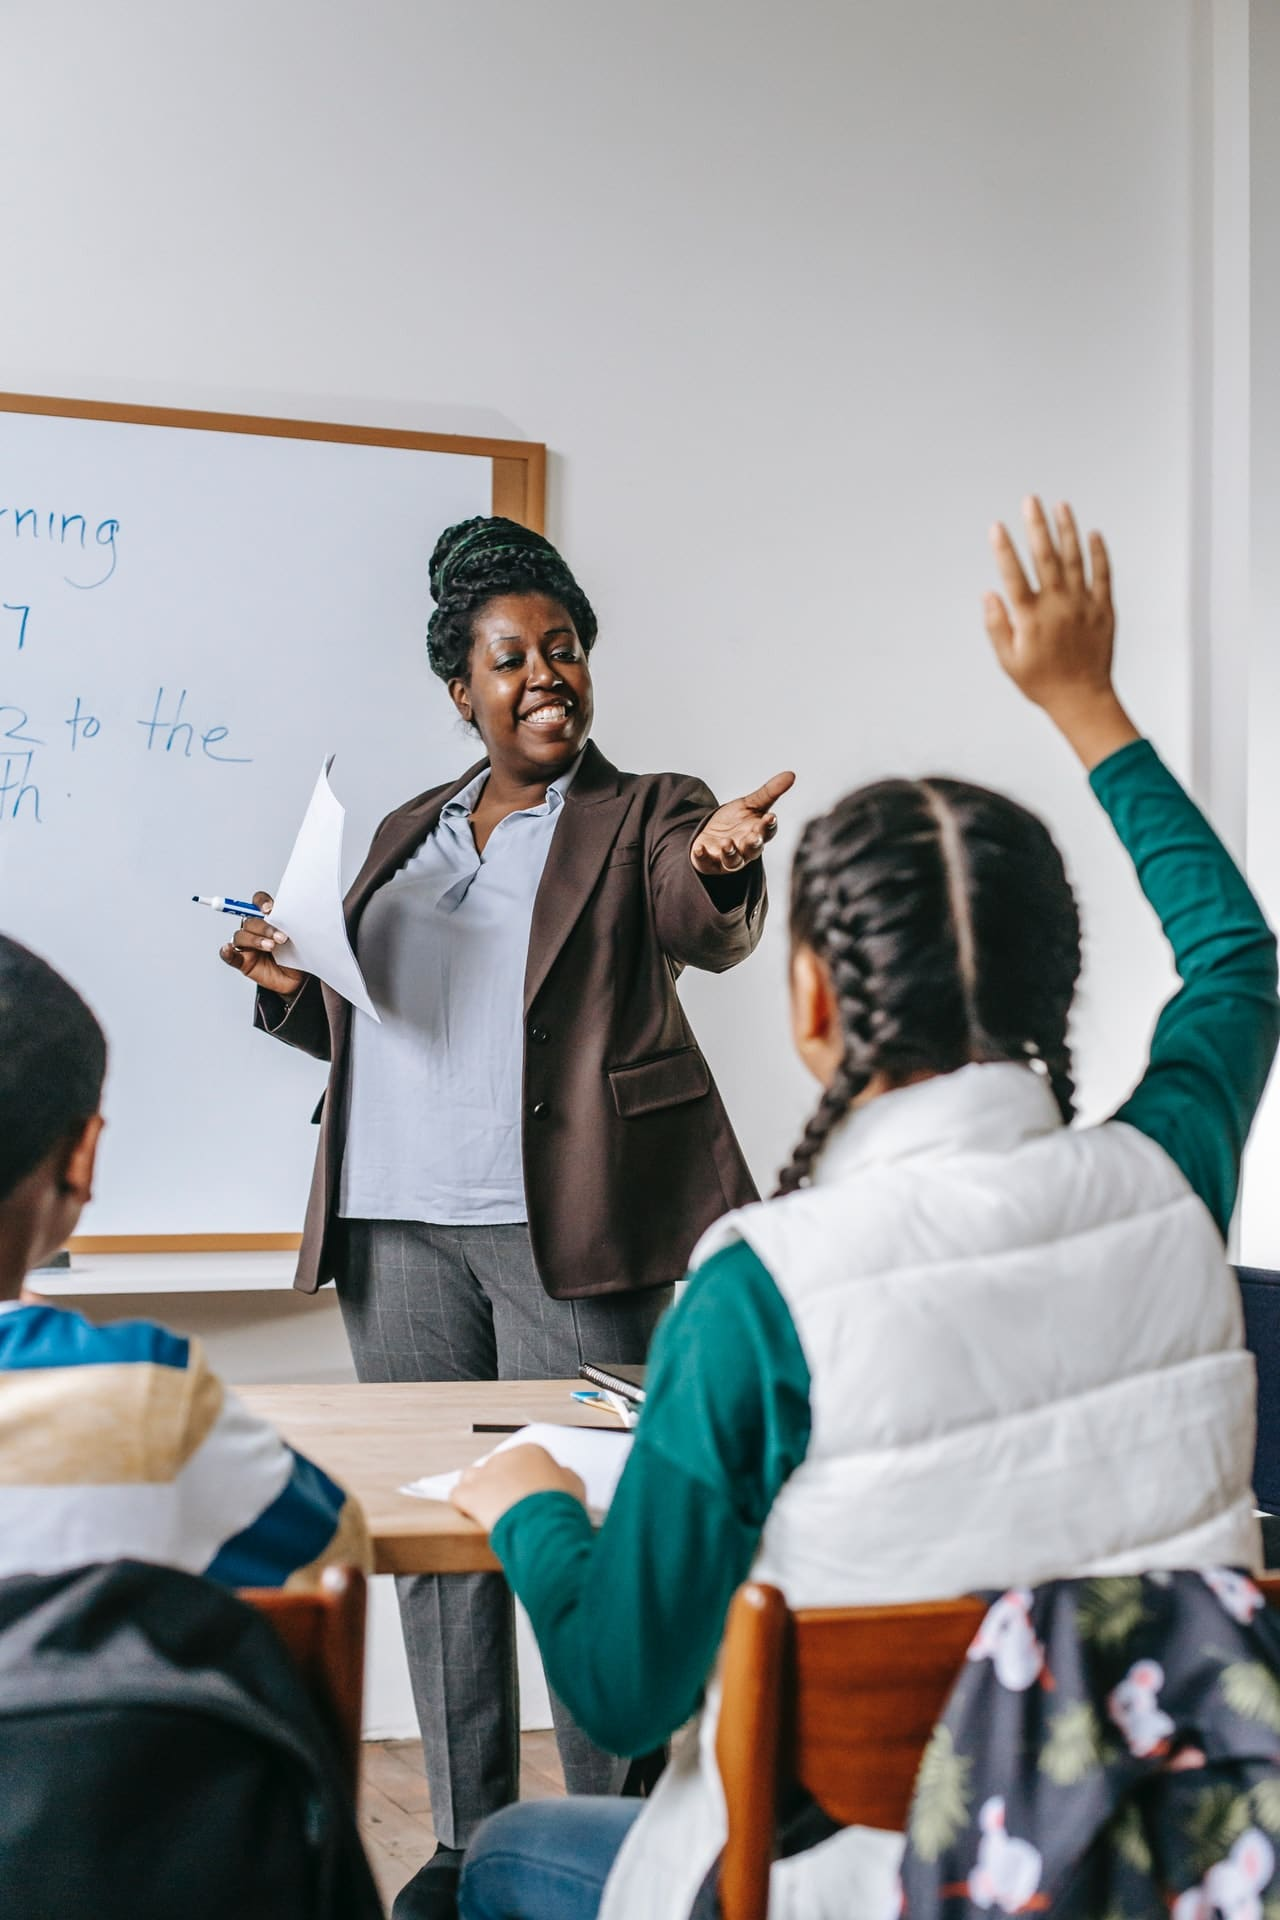 creative-ways-to-teach-english